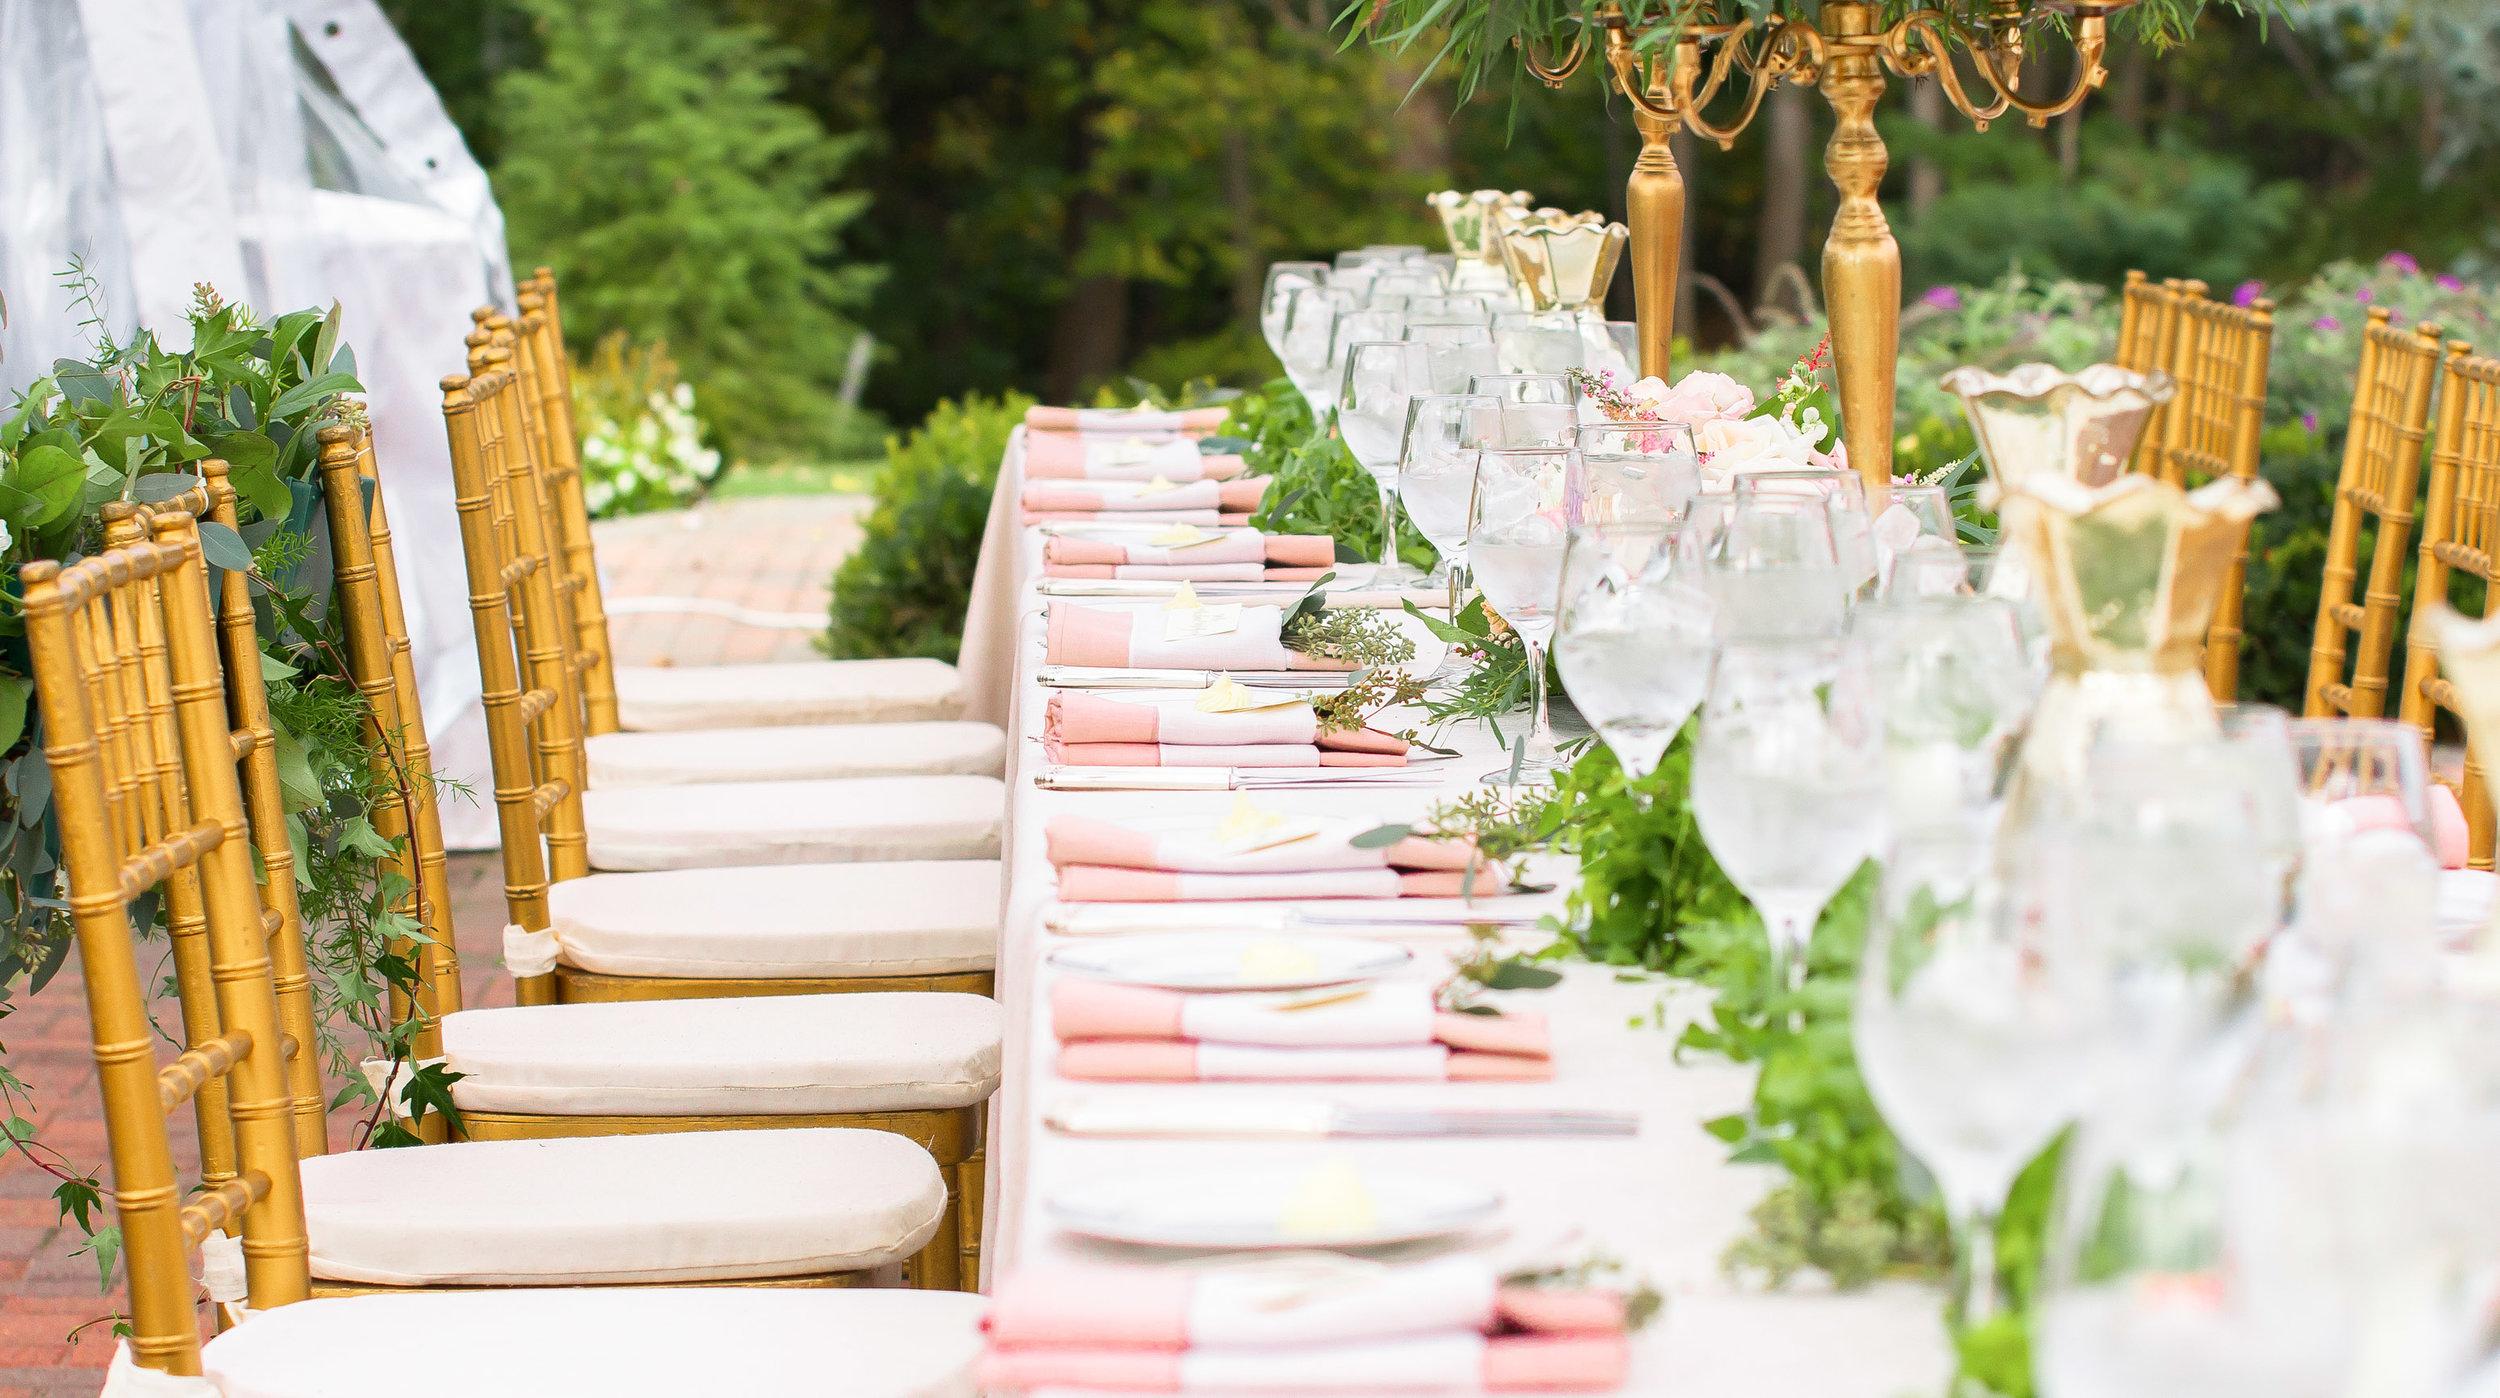 Oxon Hill Manor wedding photos in Washington dc by jessica nazarova